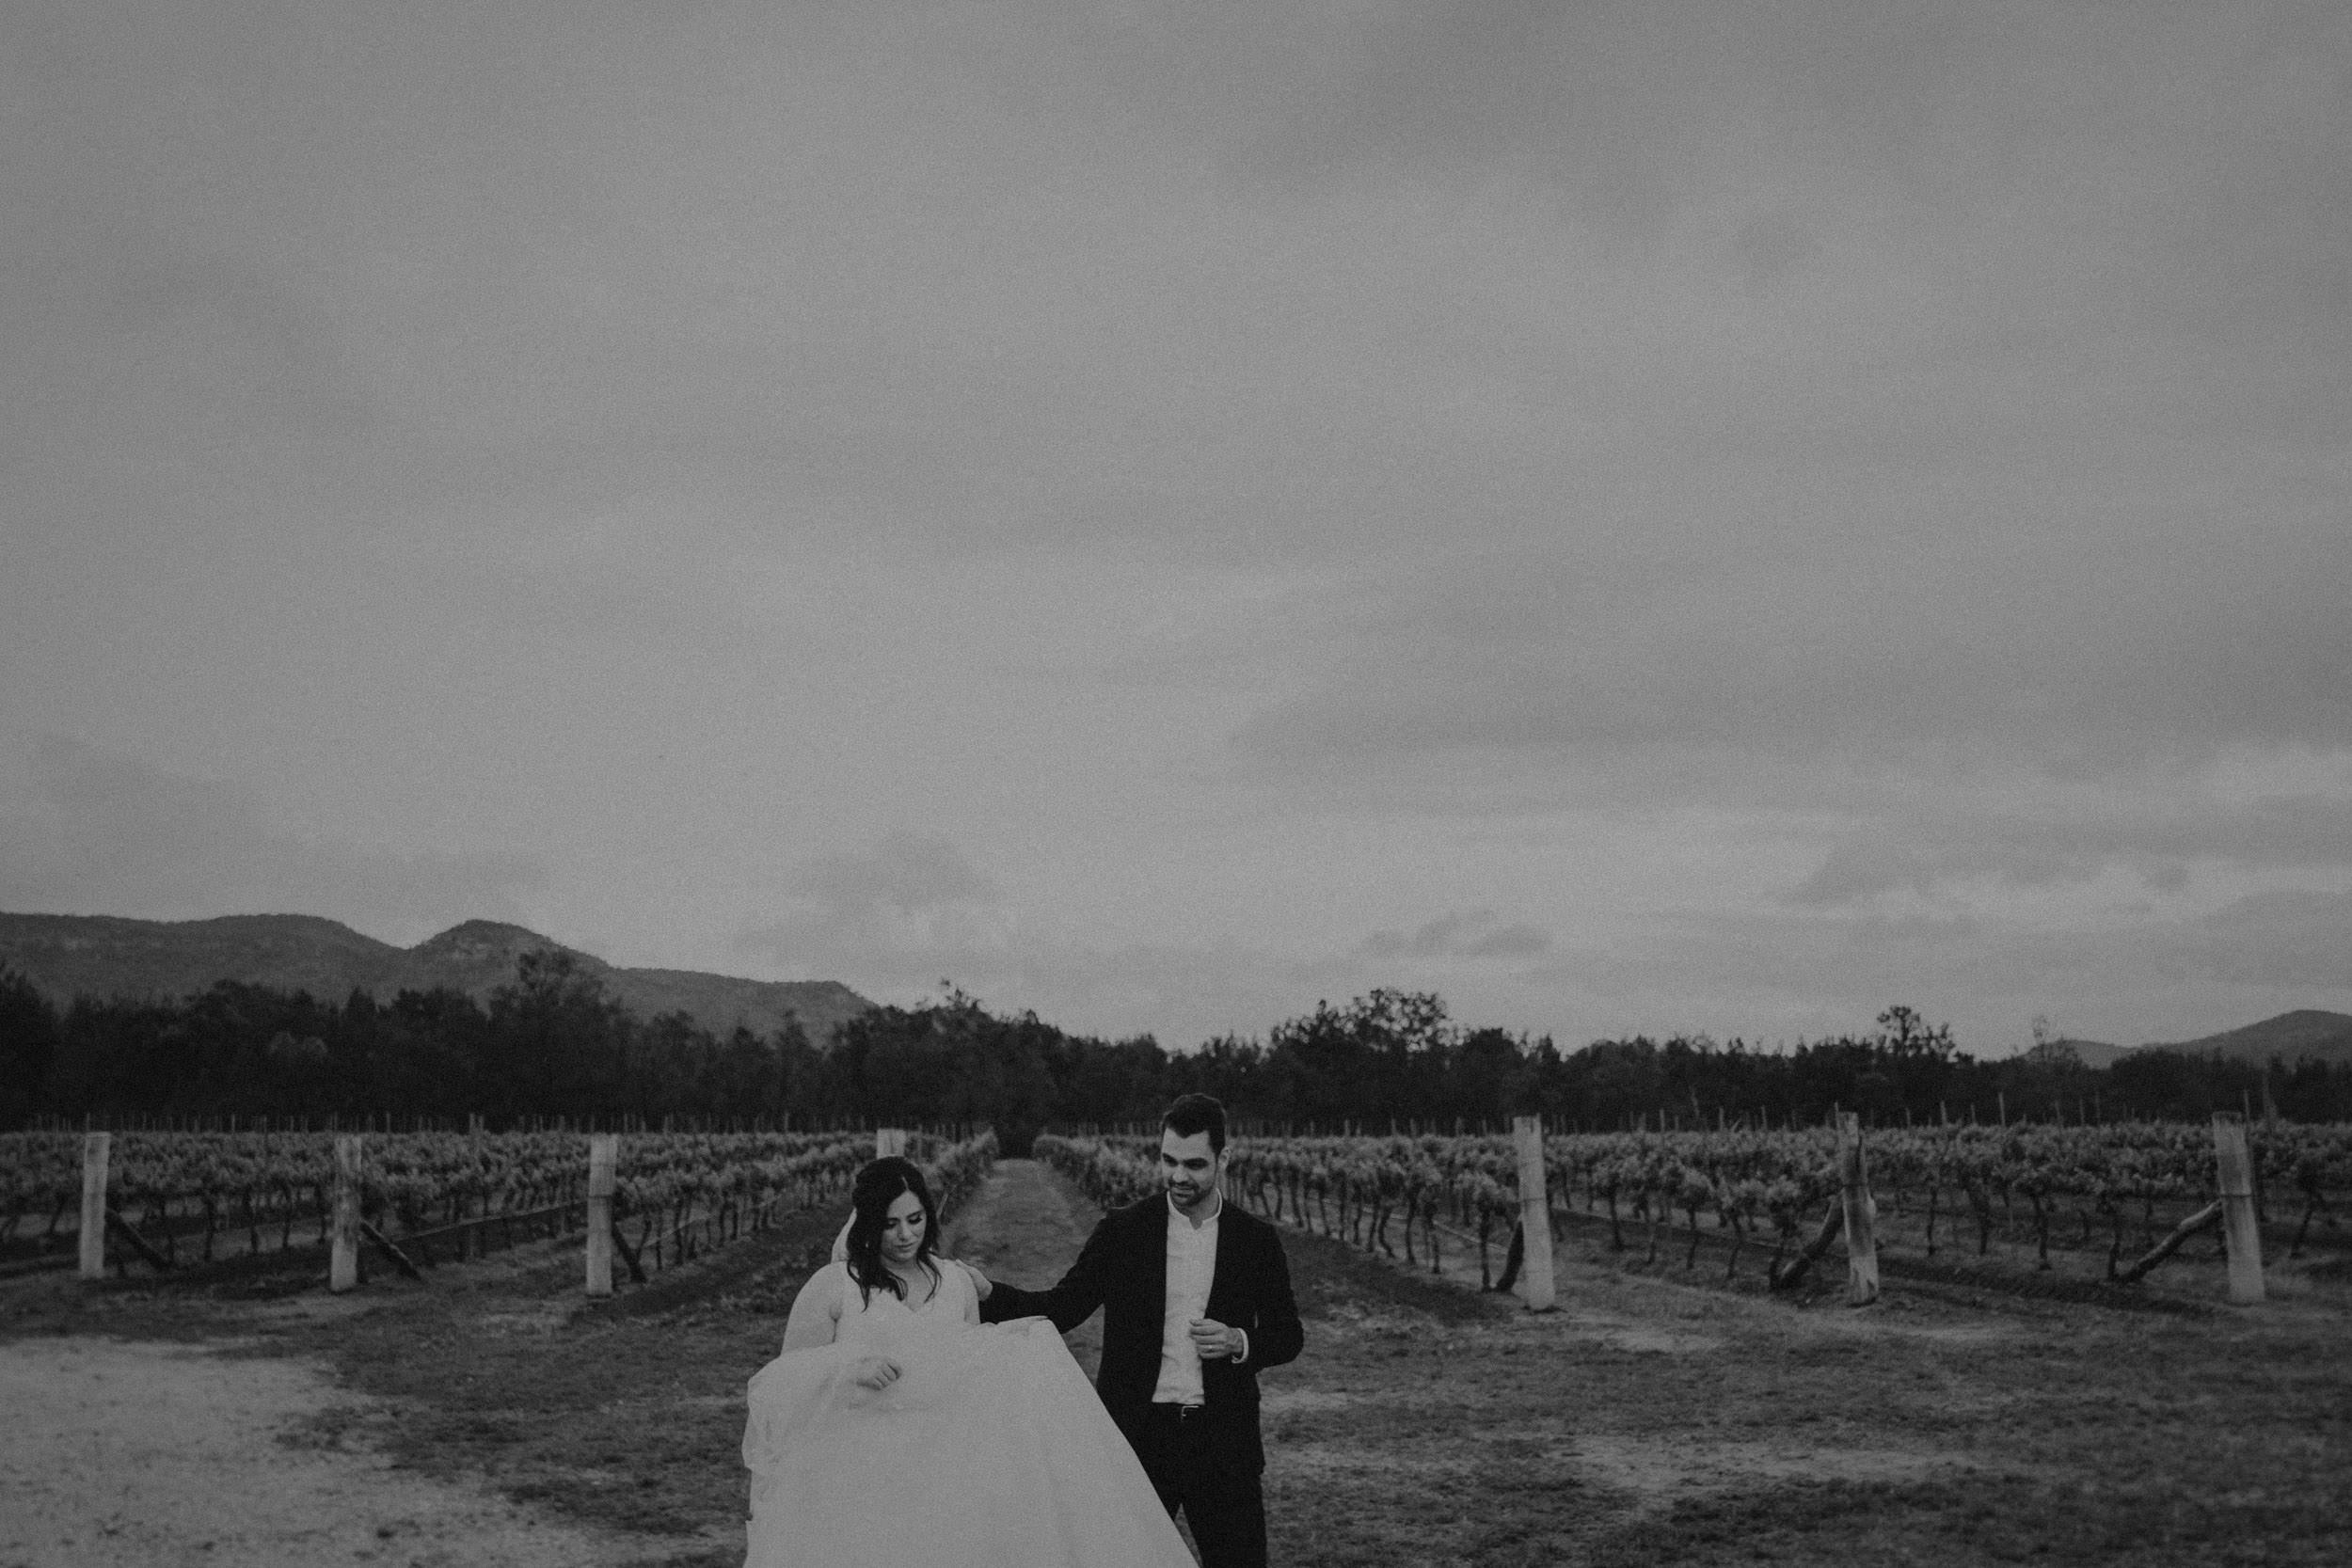 s+j_top_elopement wedding photography_kings & thieves_blog - 409.jpg